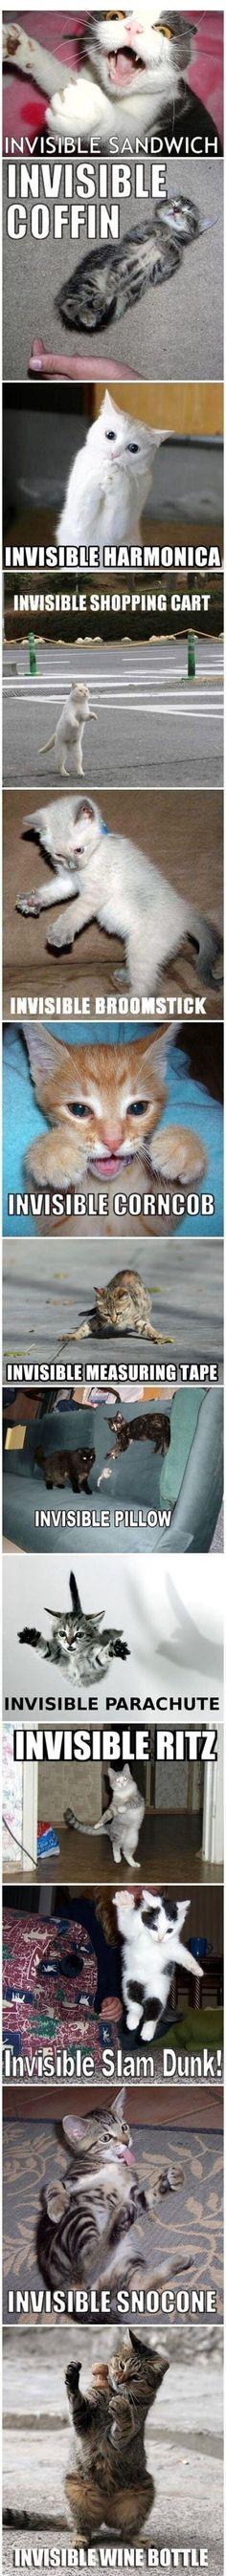 Cats go figure